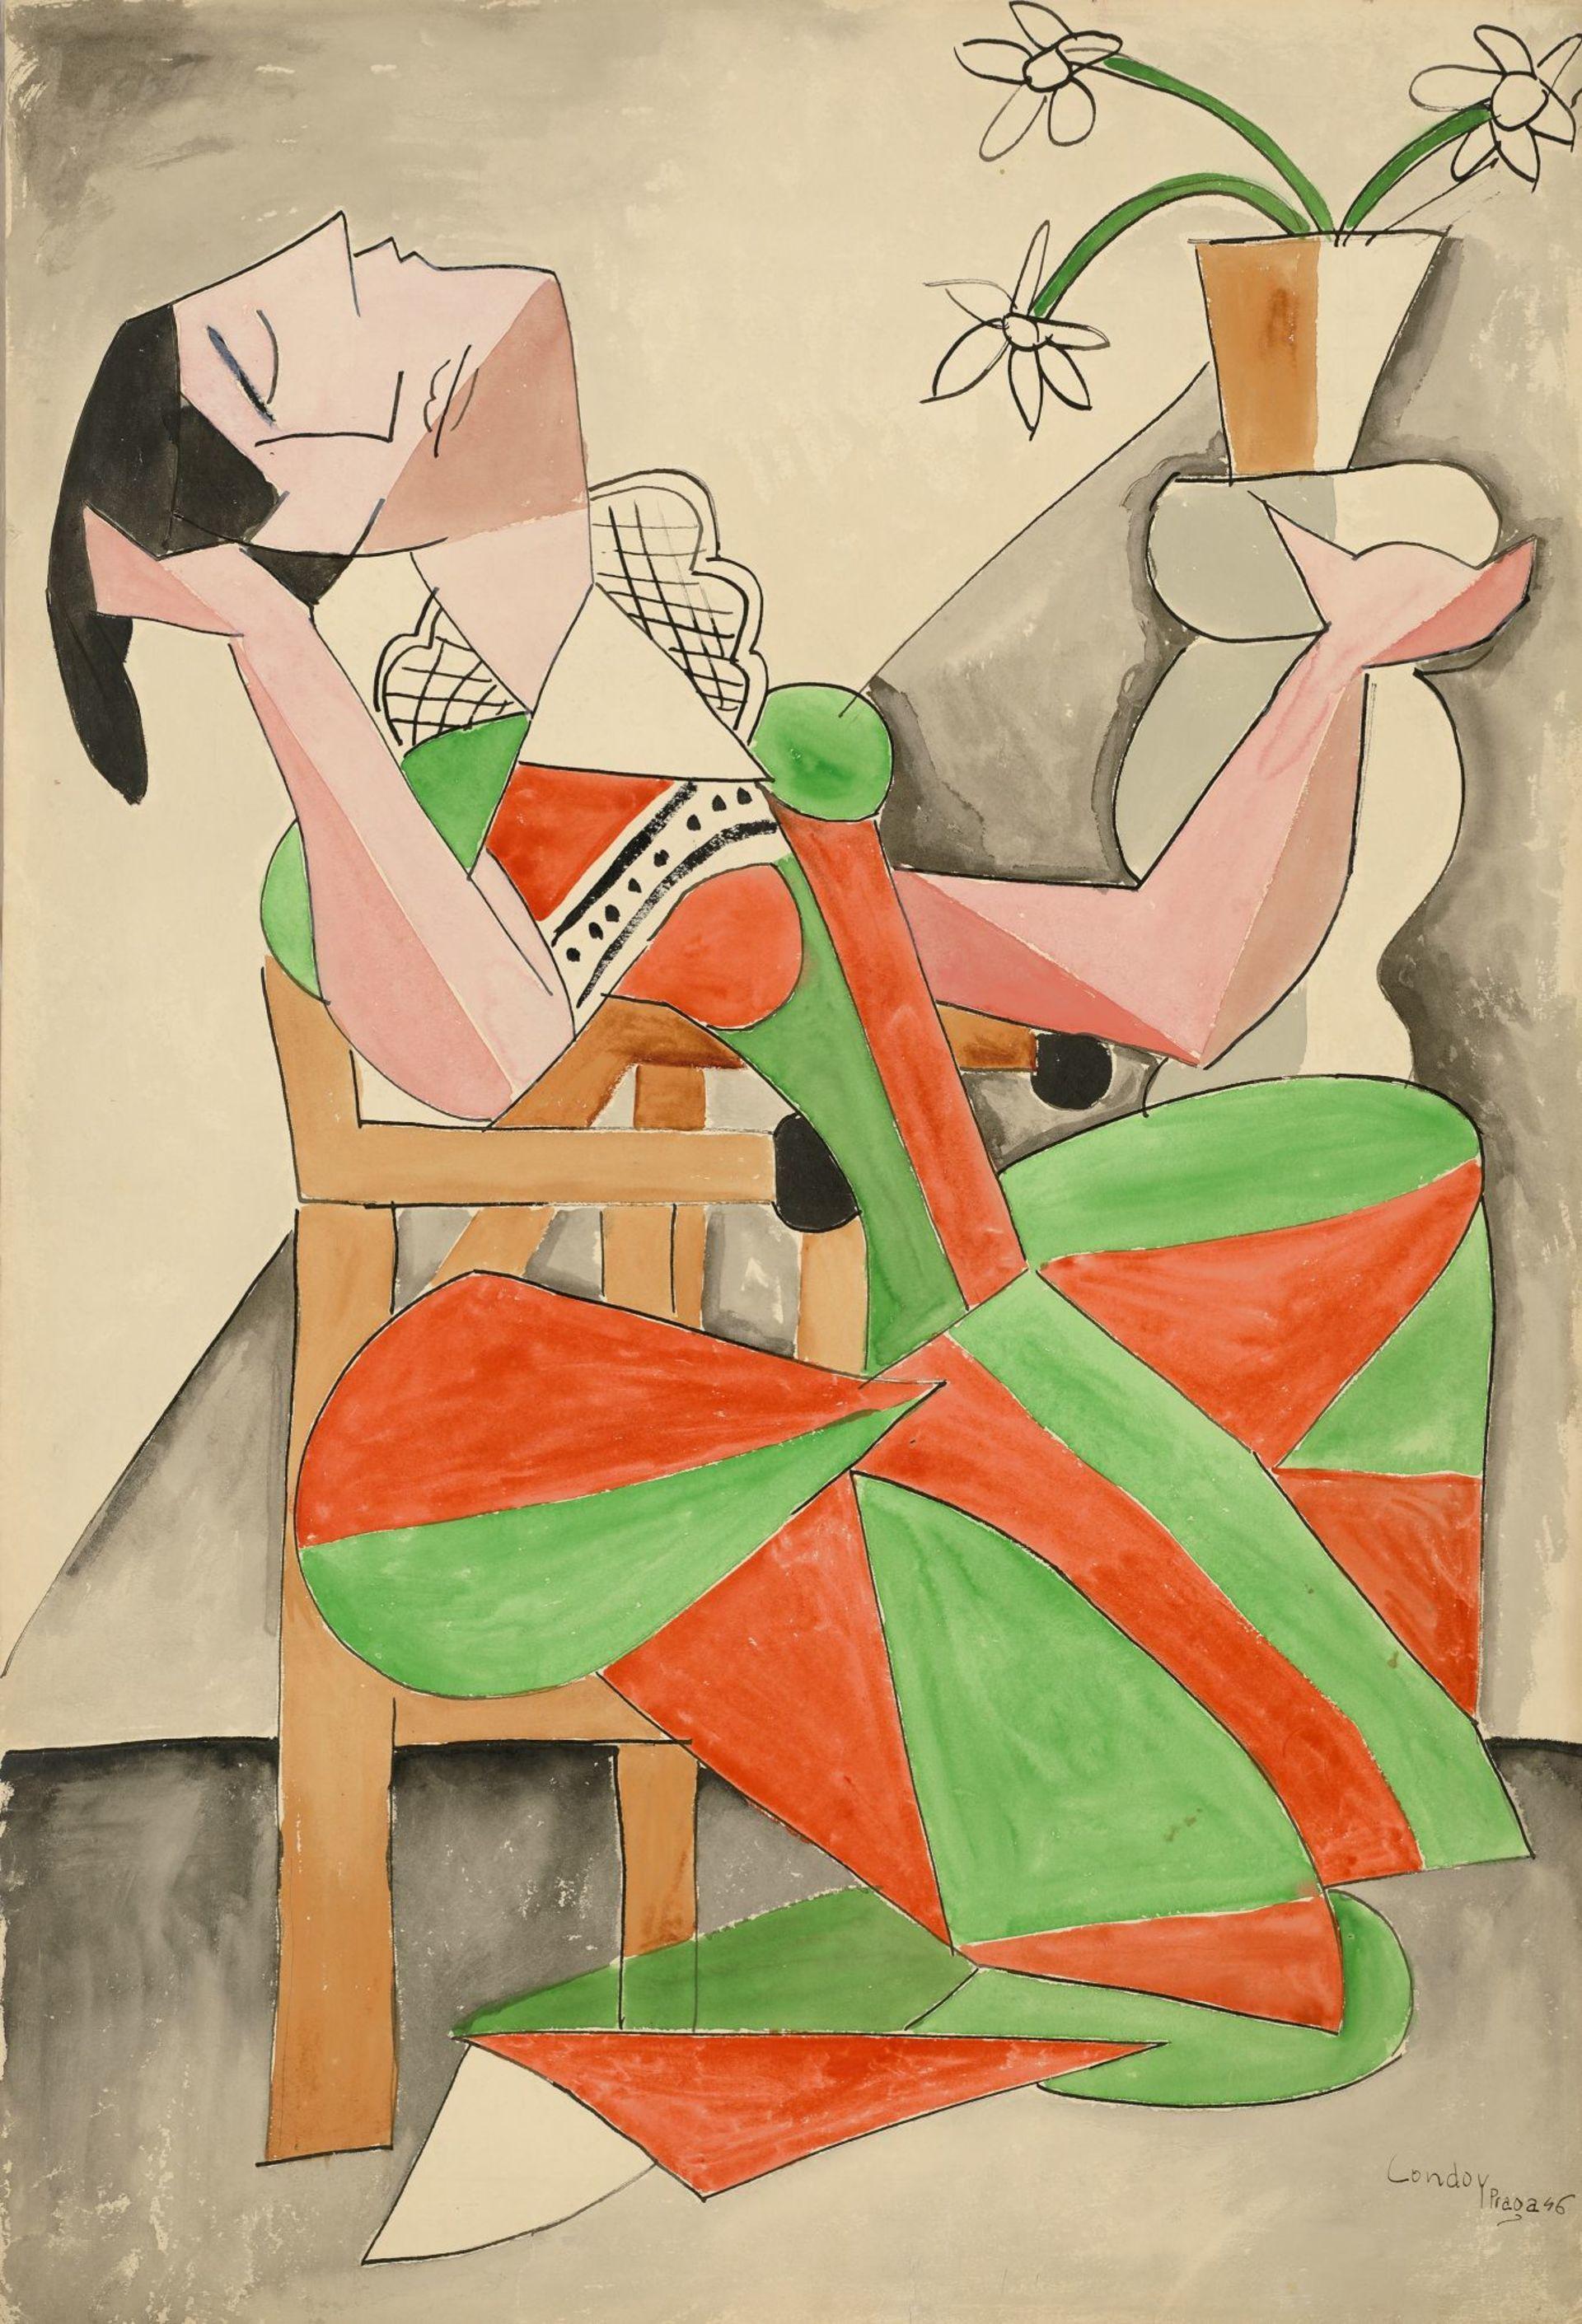 Honorio-Garcia-Condoy-Zena-v-kresle-tus-akvarel-papir-GVUOa.jpg